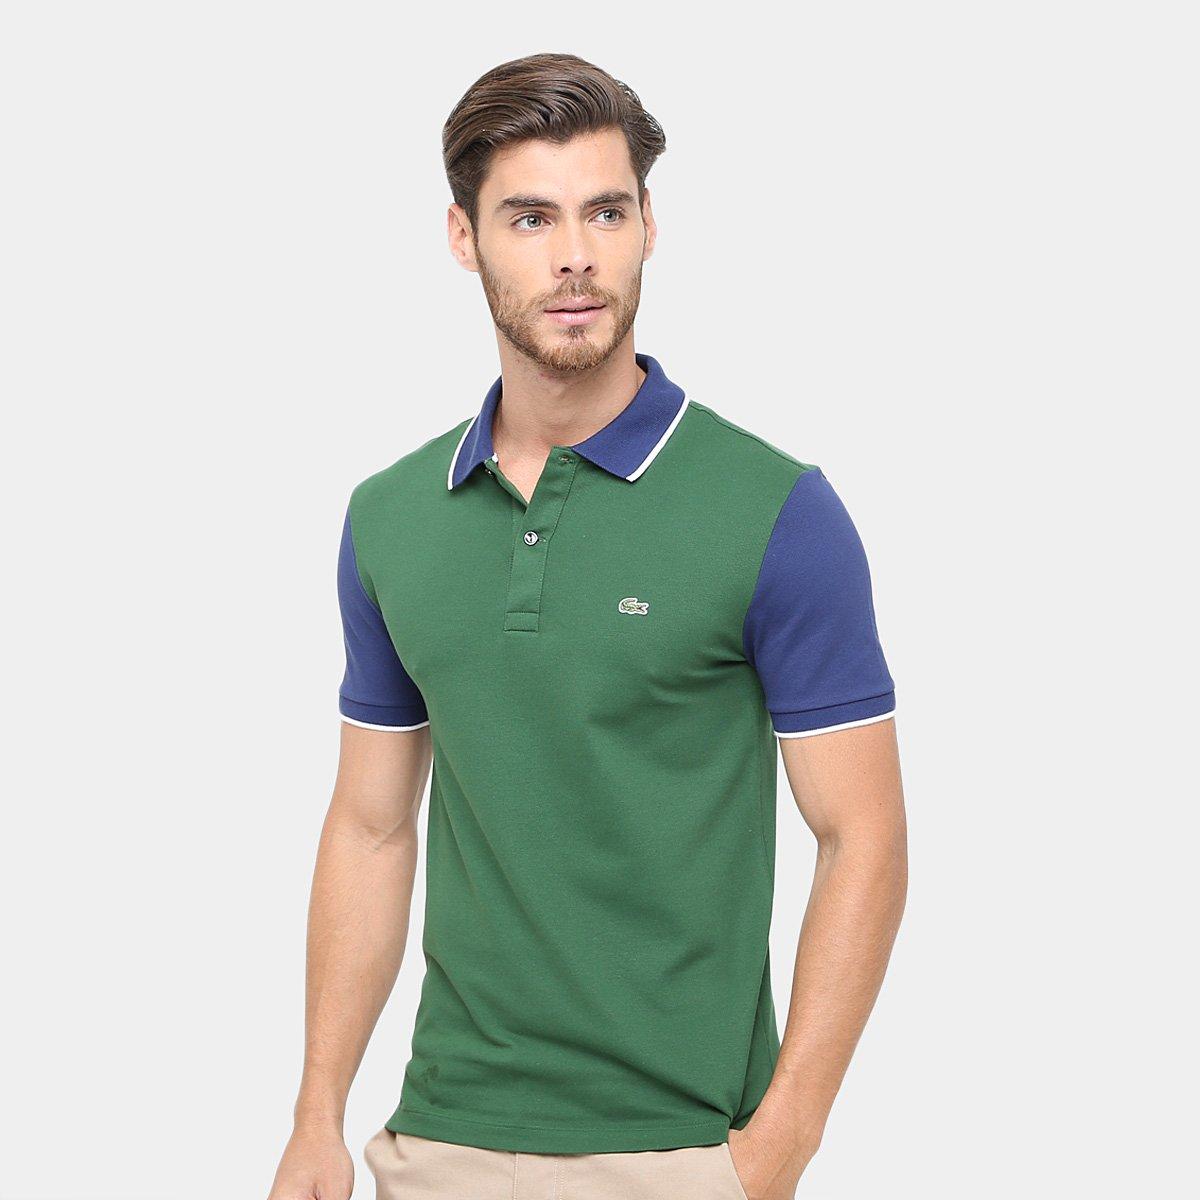 6230df08bbc5c Camisa Polo Lacoste Piquet Bicolor Slim Fit Masculina - Compre Agora ...